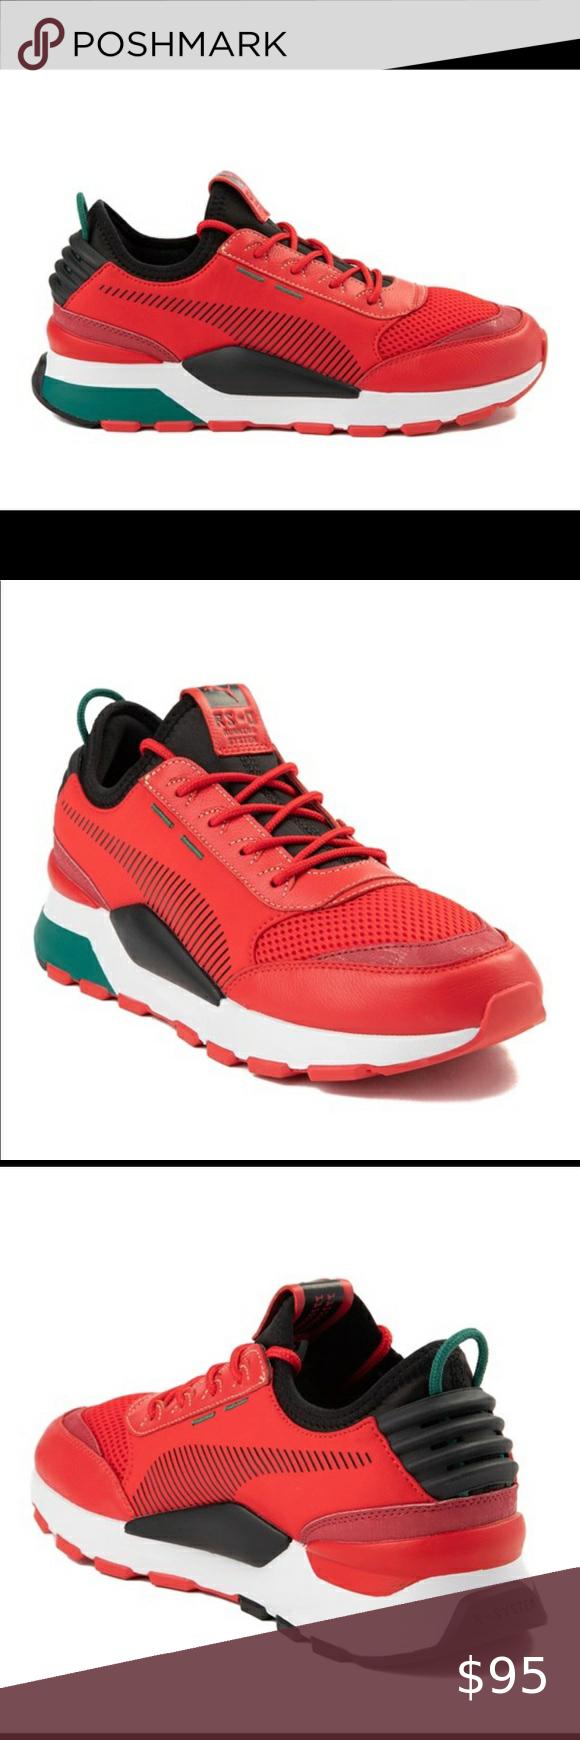 Mens Puma Athletic Shoe Sneaker Red